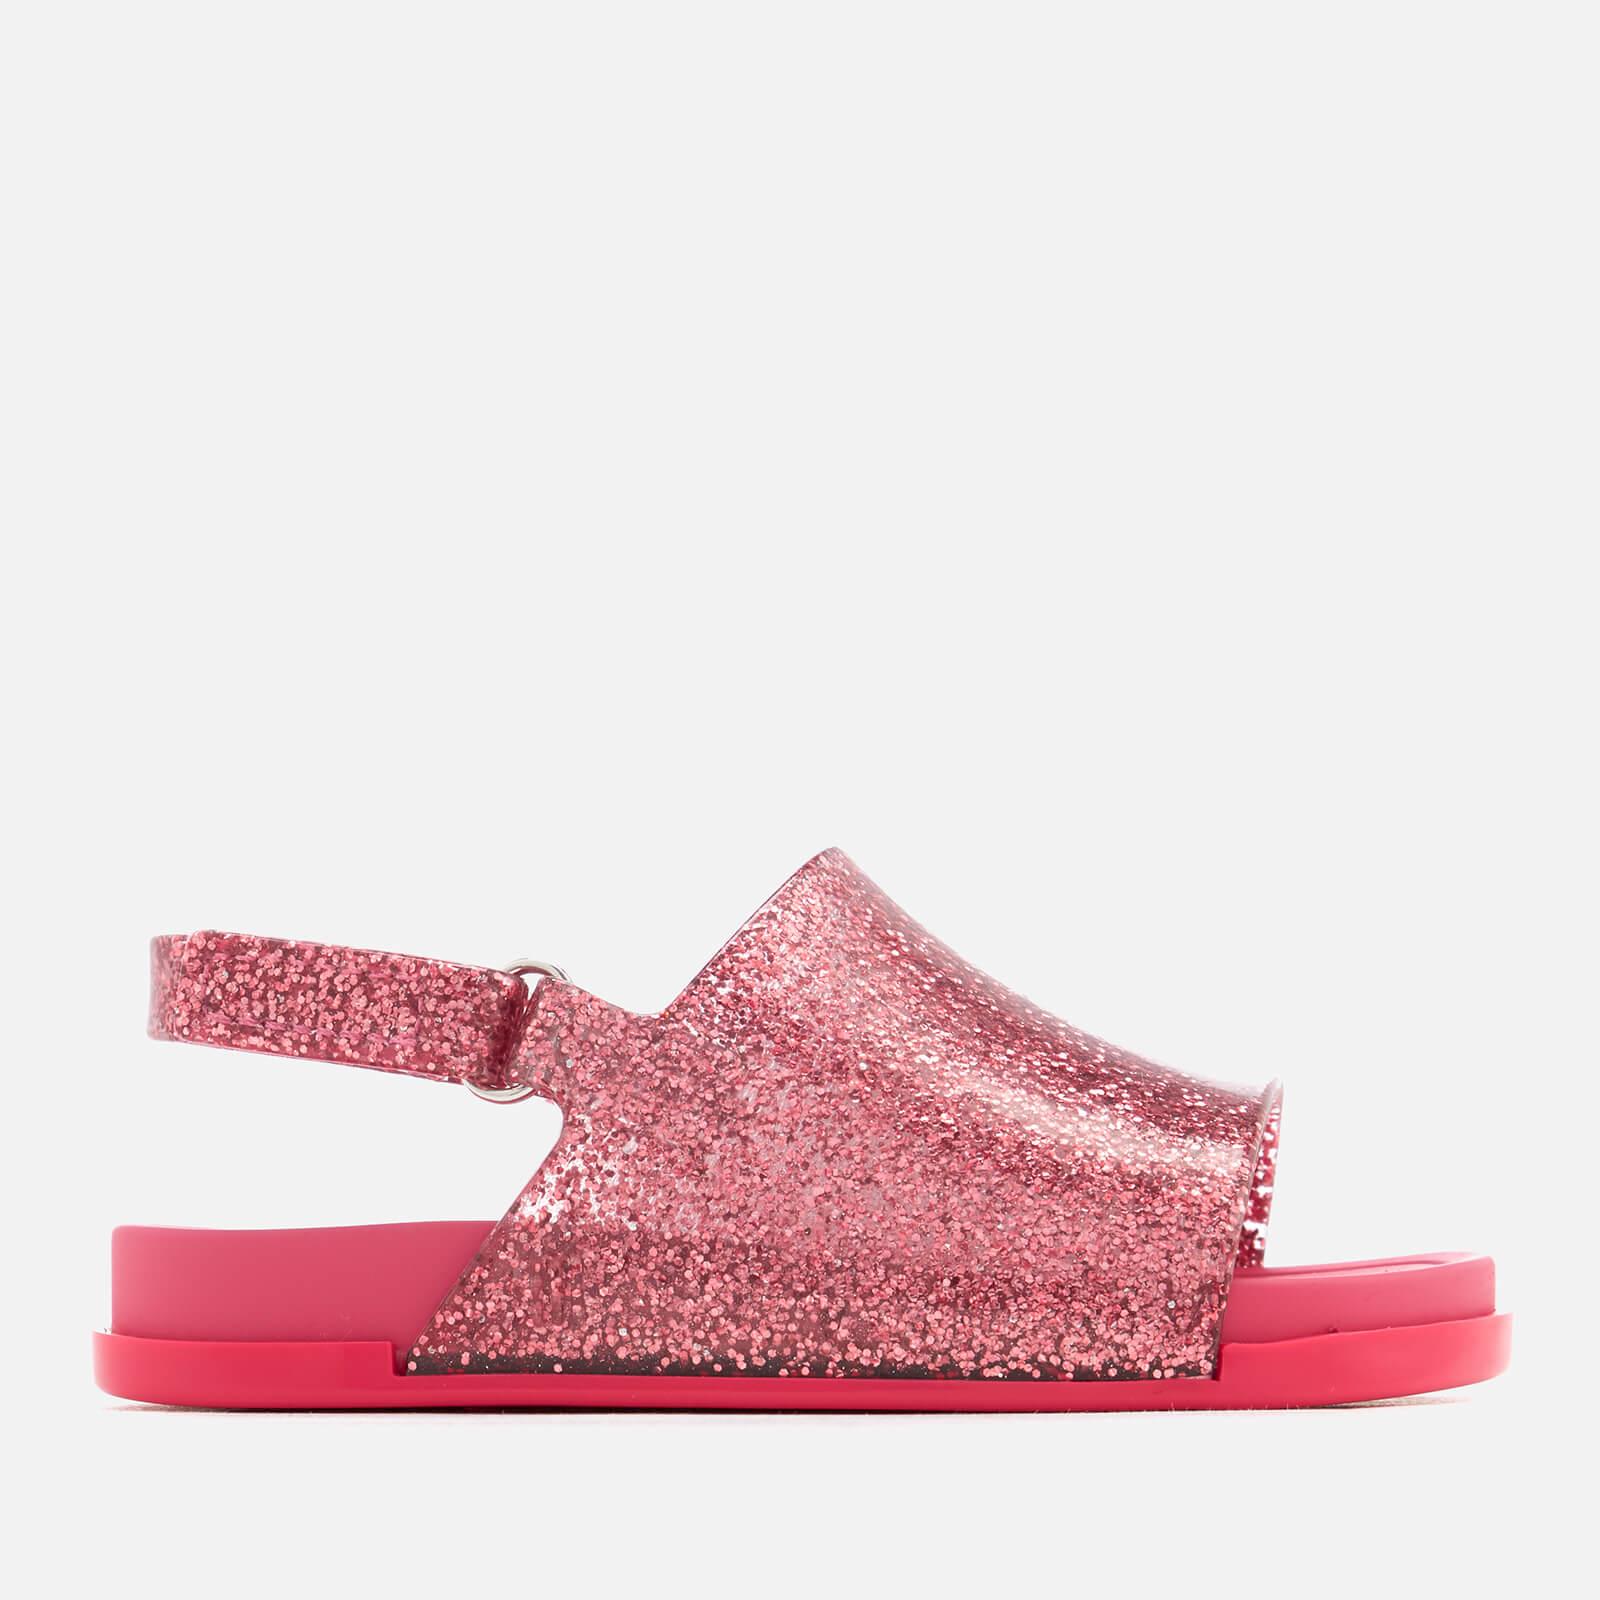 Mini Melissa Toddlers Beach Slide Sandals - Pink Glitter - UK 6 Toddler - Pink